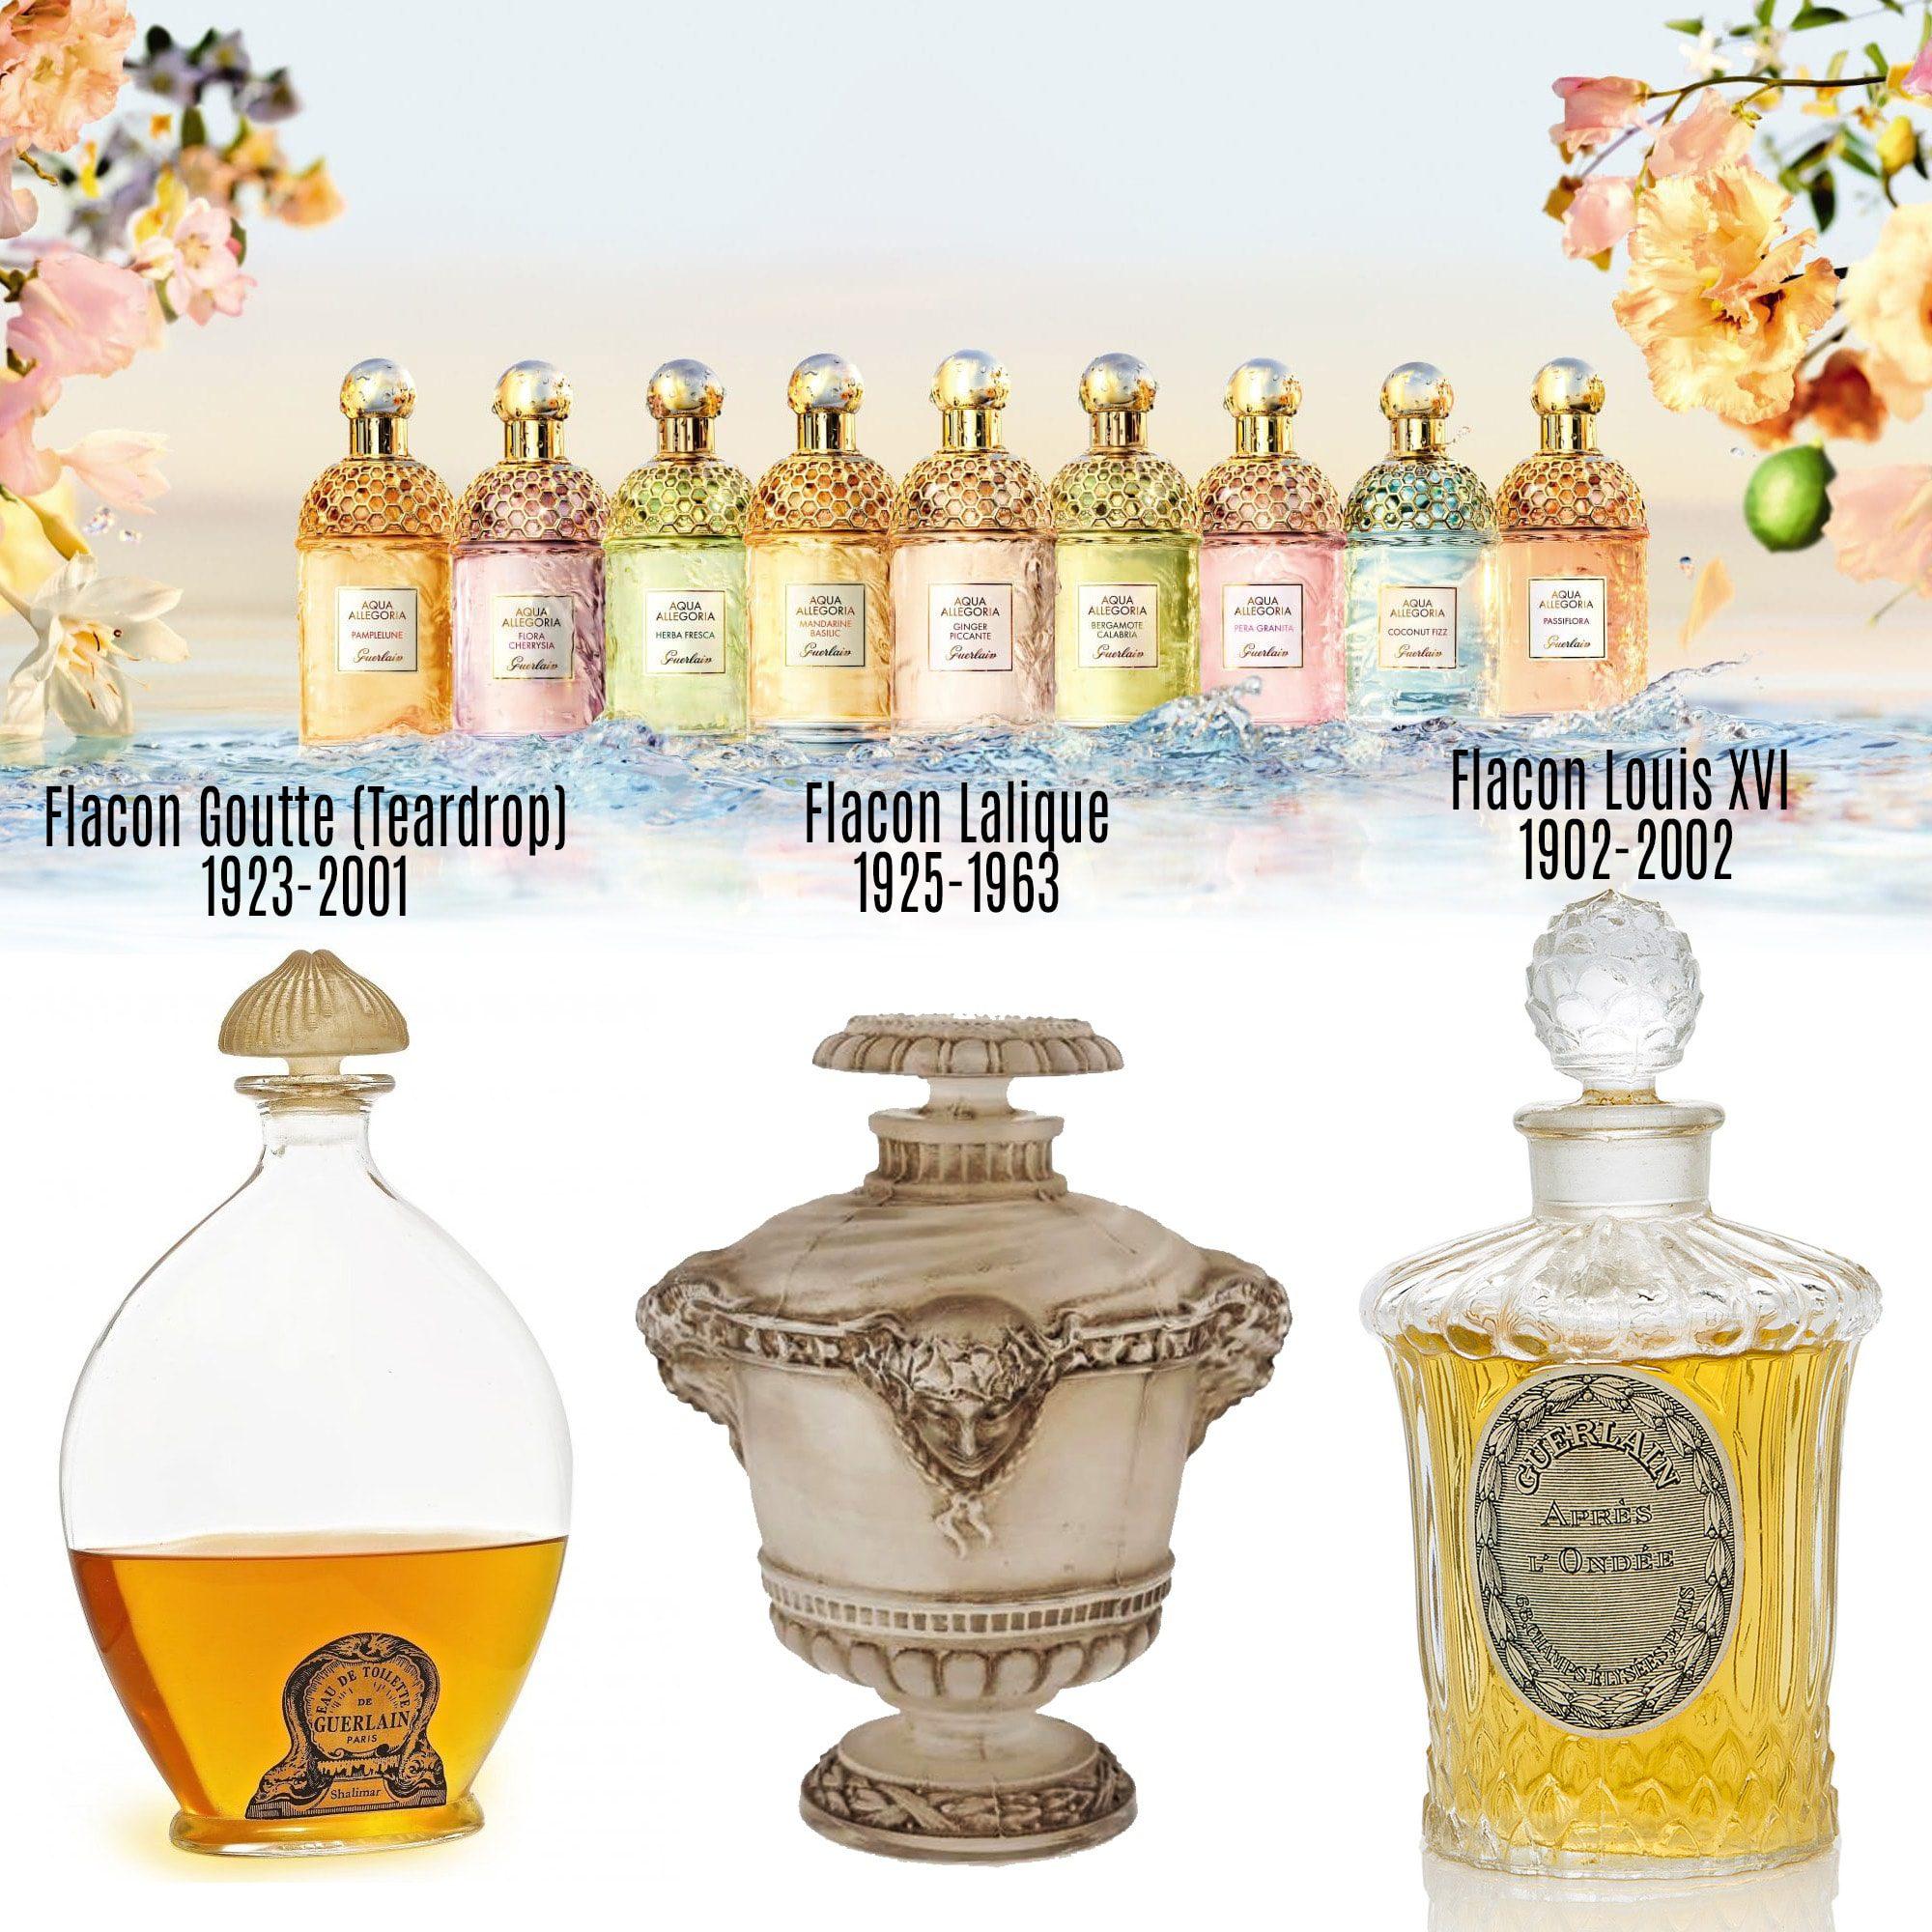 Flacon Goutte (Teardrop), Flacon Lalique, Flacon Louis XVI - Tresors INPI por RUNWAY MAGAZINE